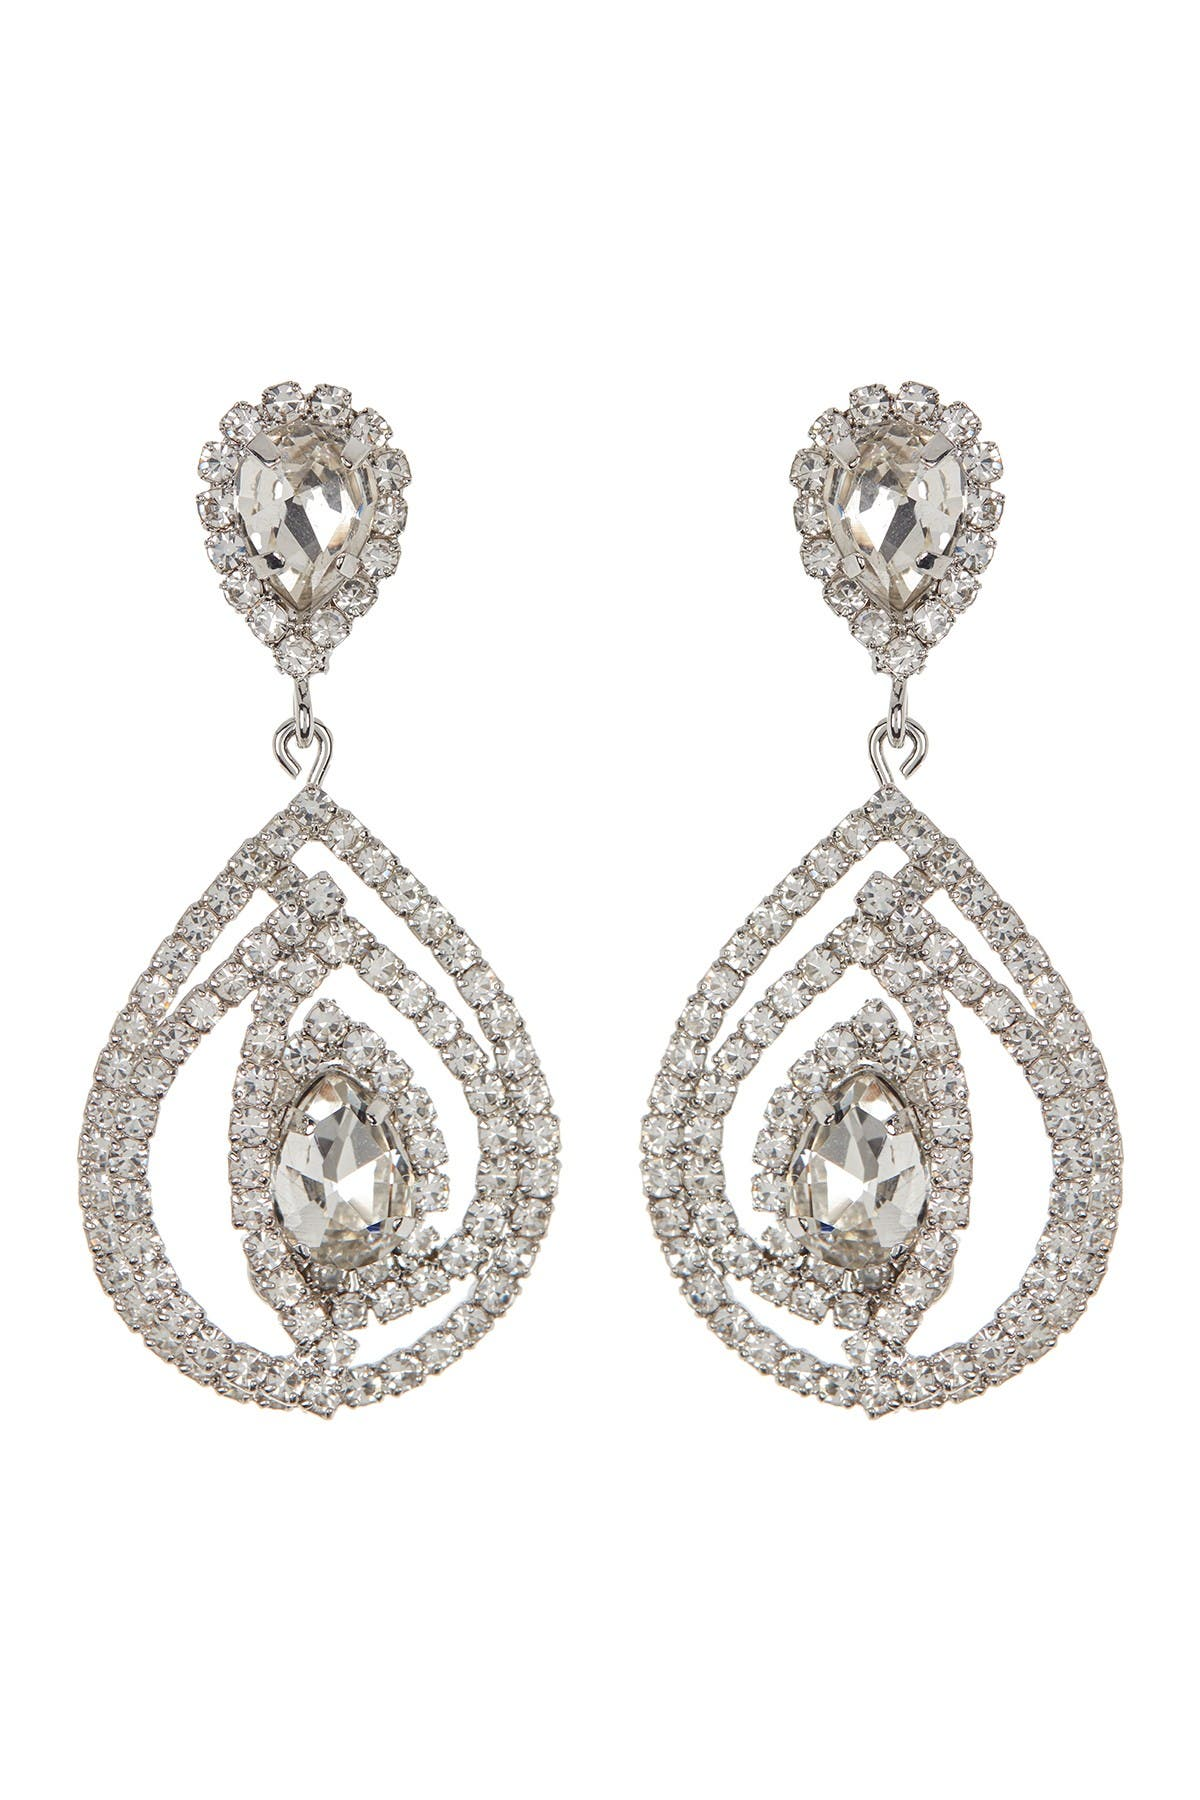 Image of CRISTABELLE Pave Crystal Open Teardrop Earrings